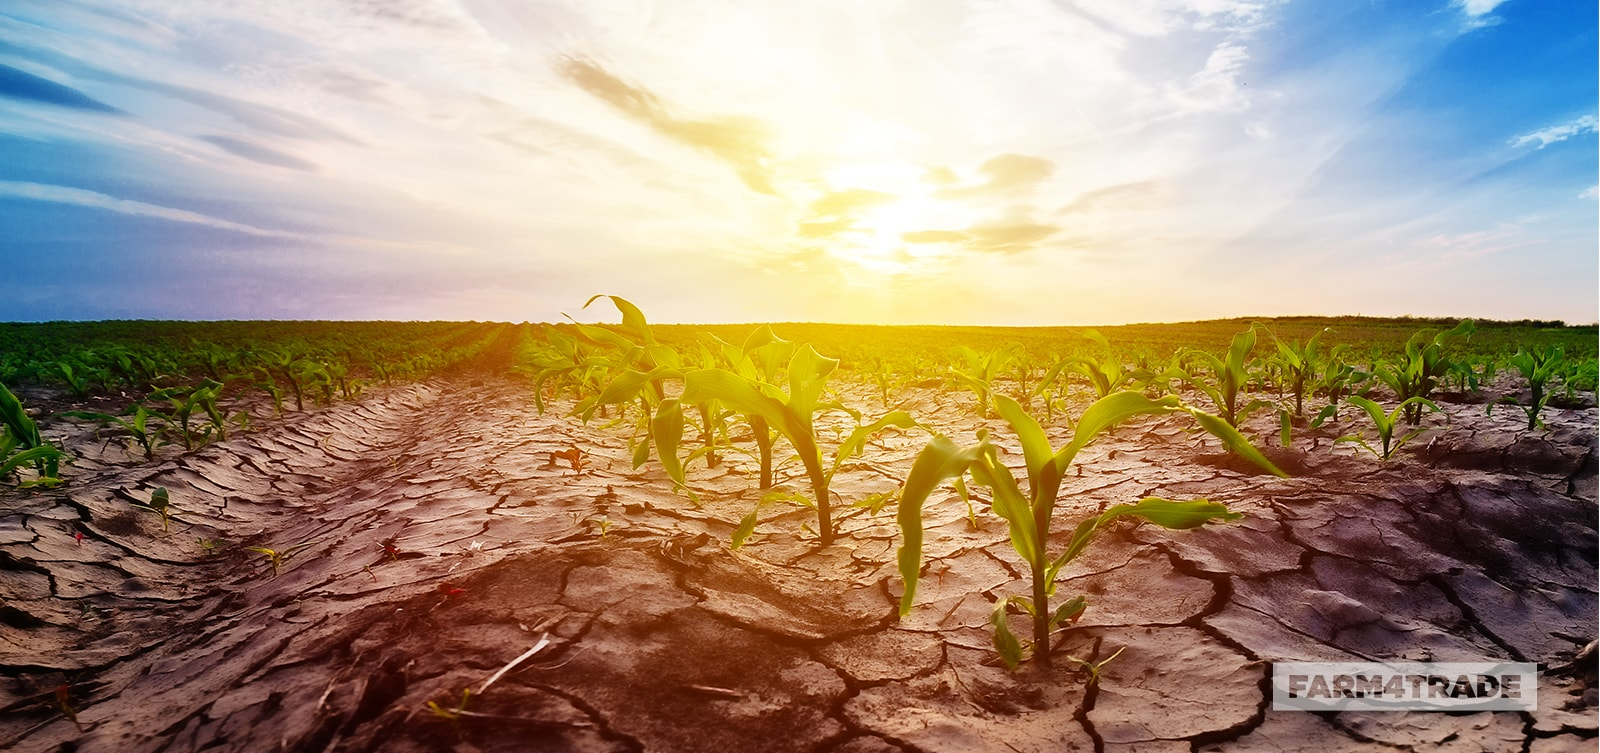 Farm4Trade-tips to prepare and survive drought